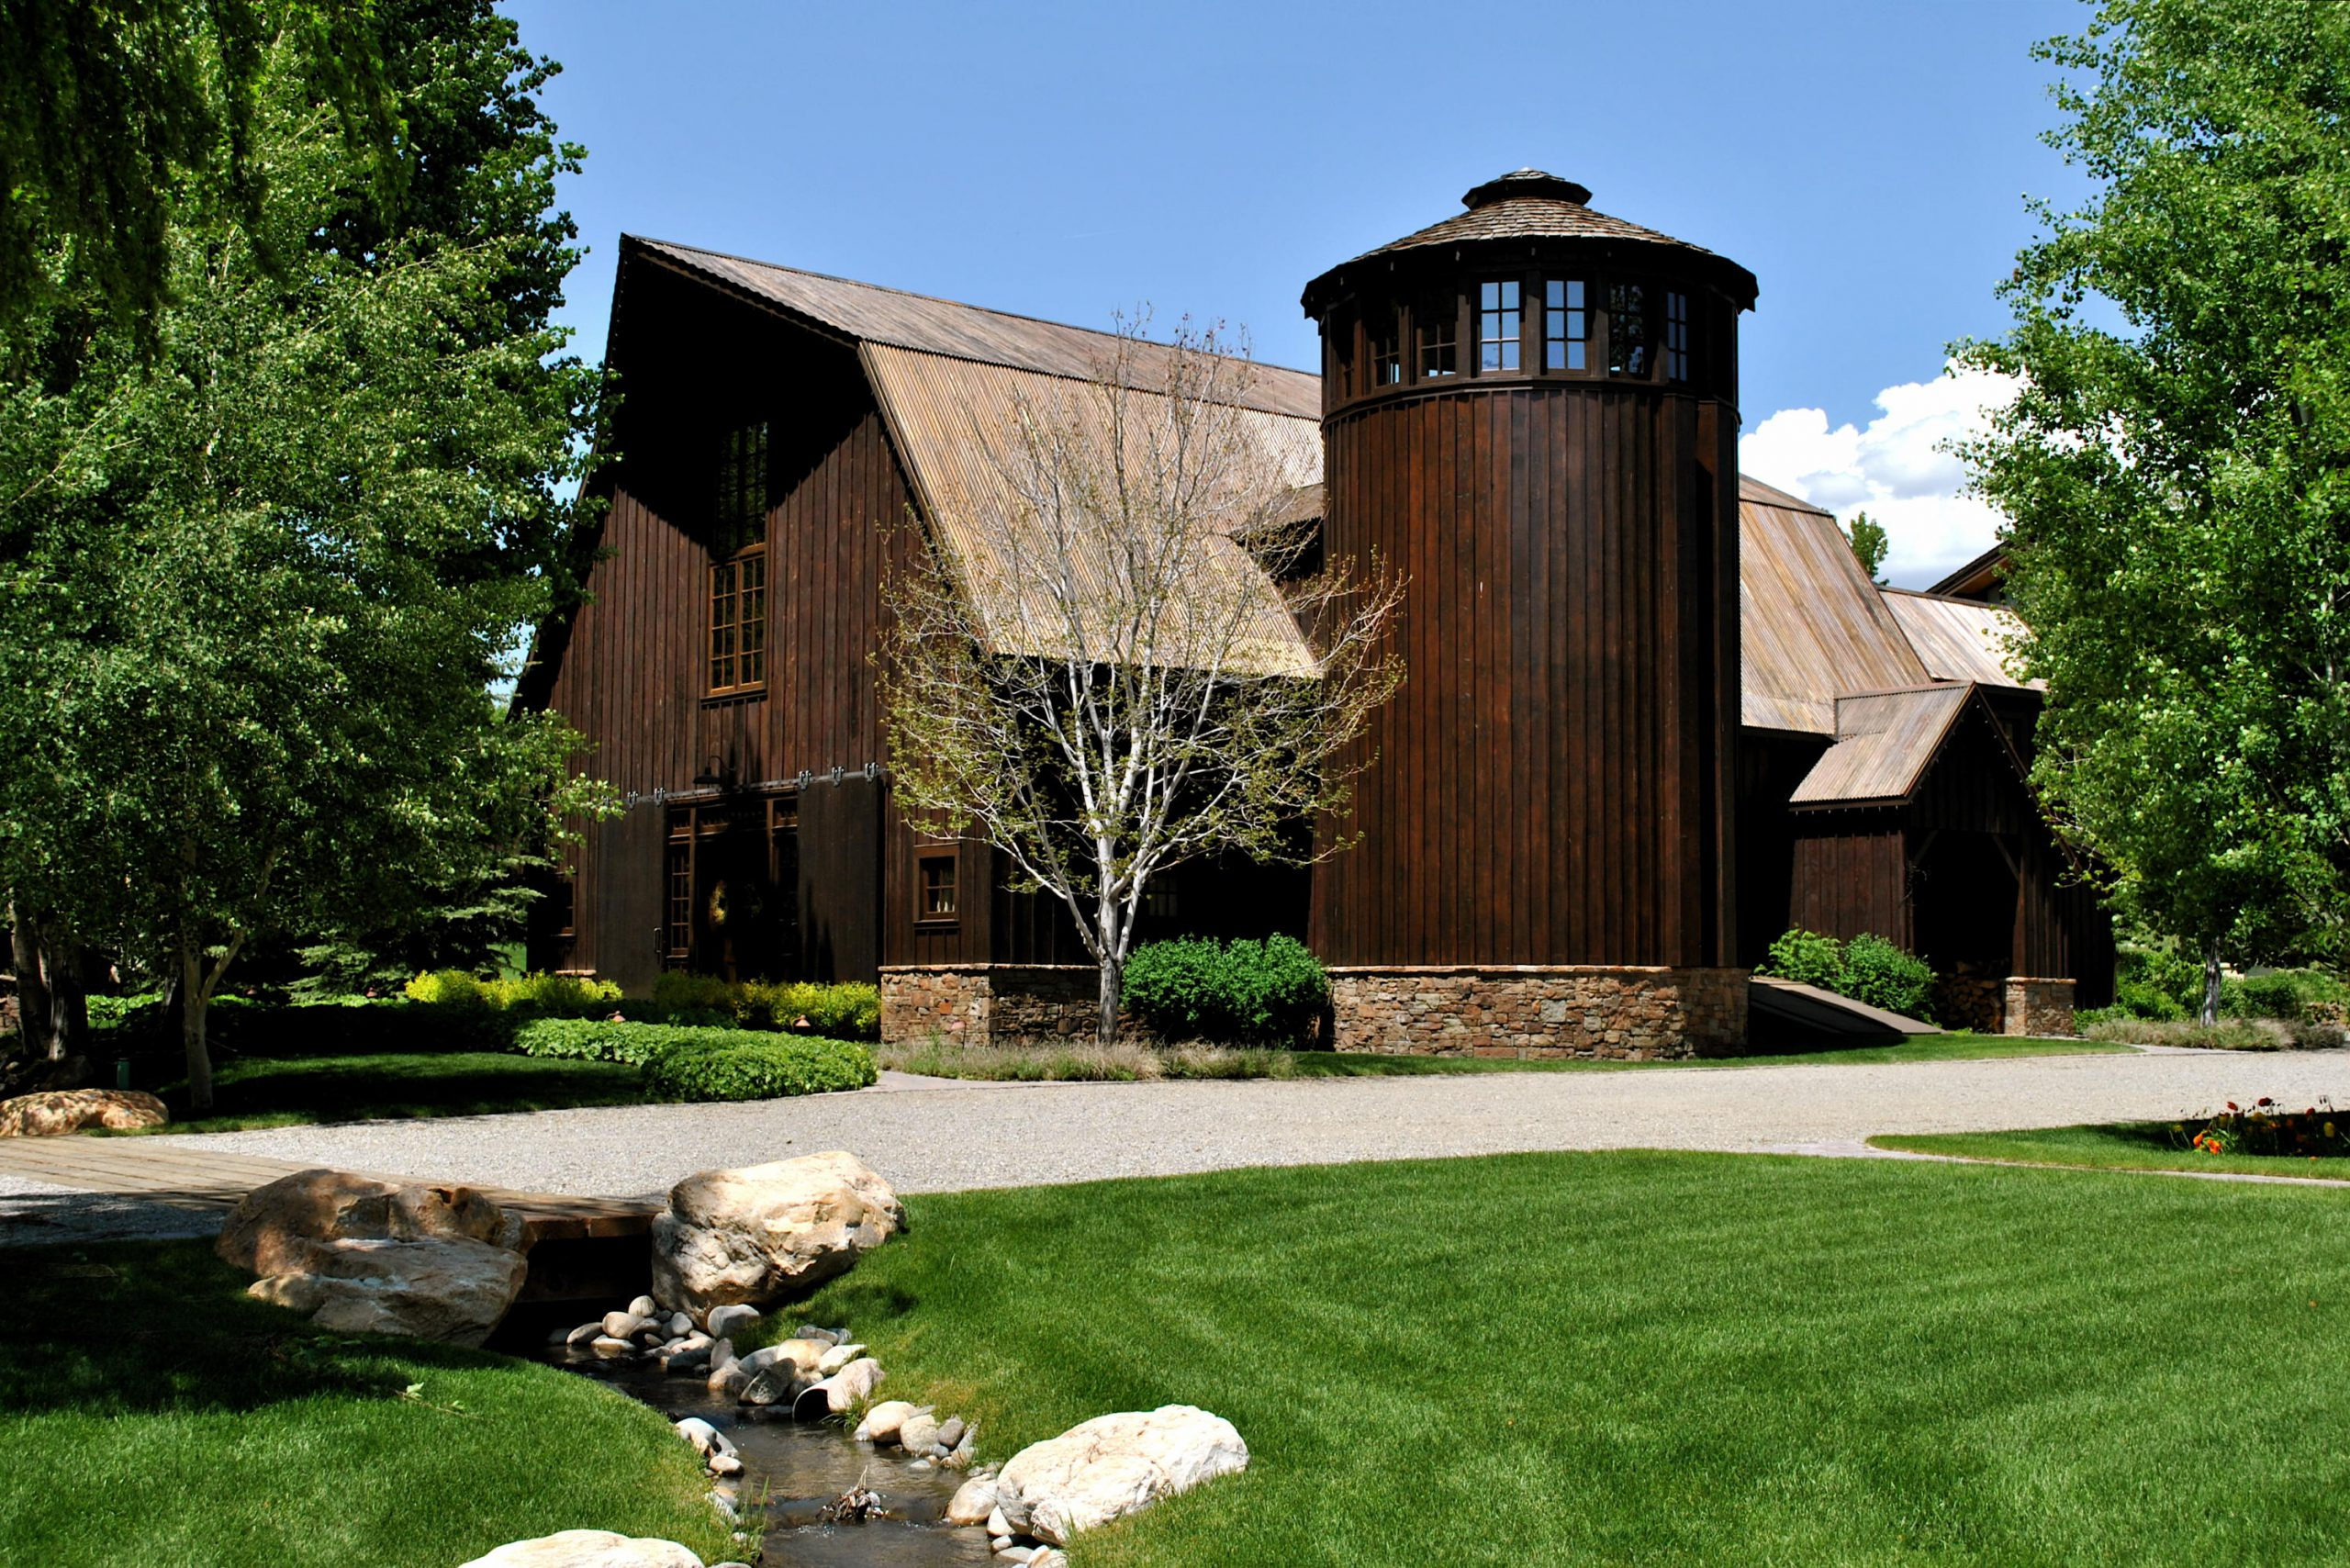 Dream House: Idaho Barn Rustic Compound (1)